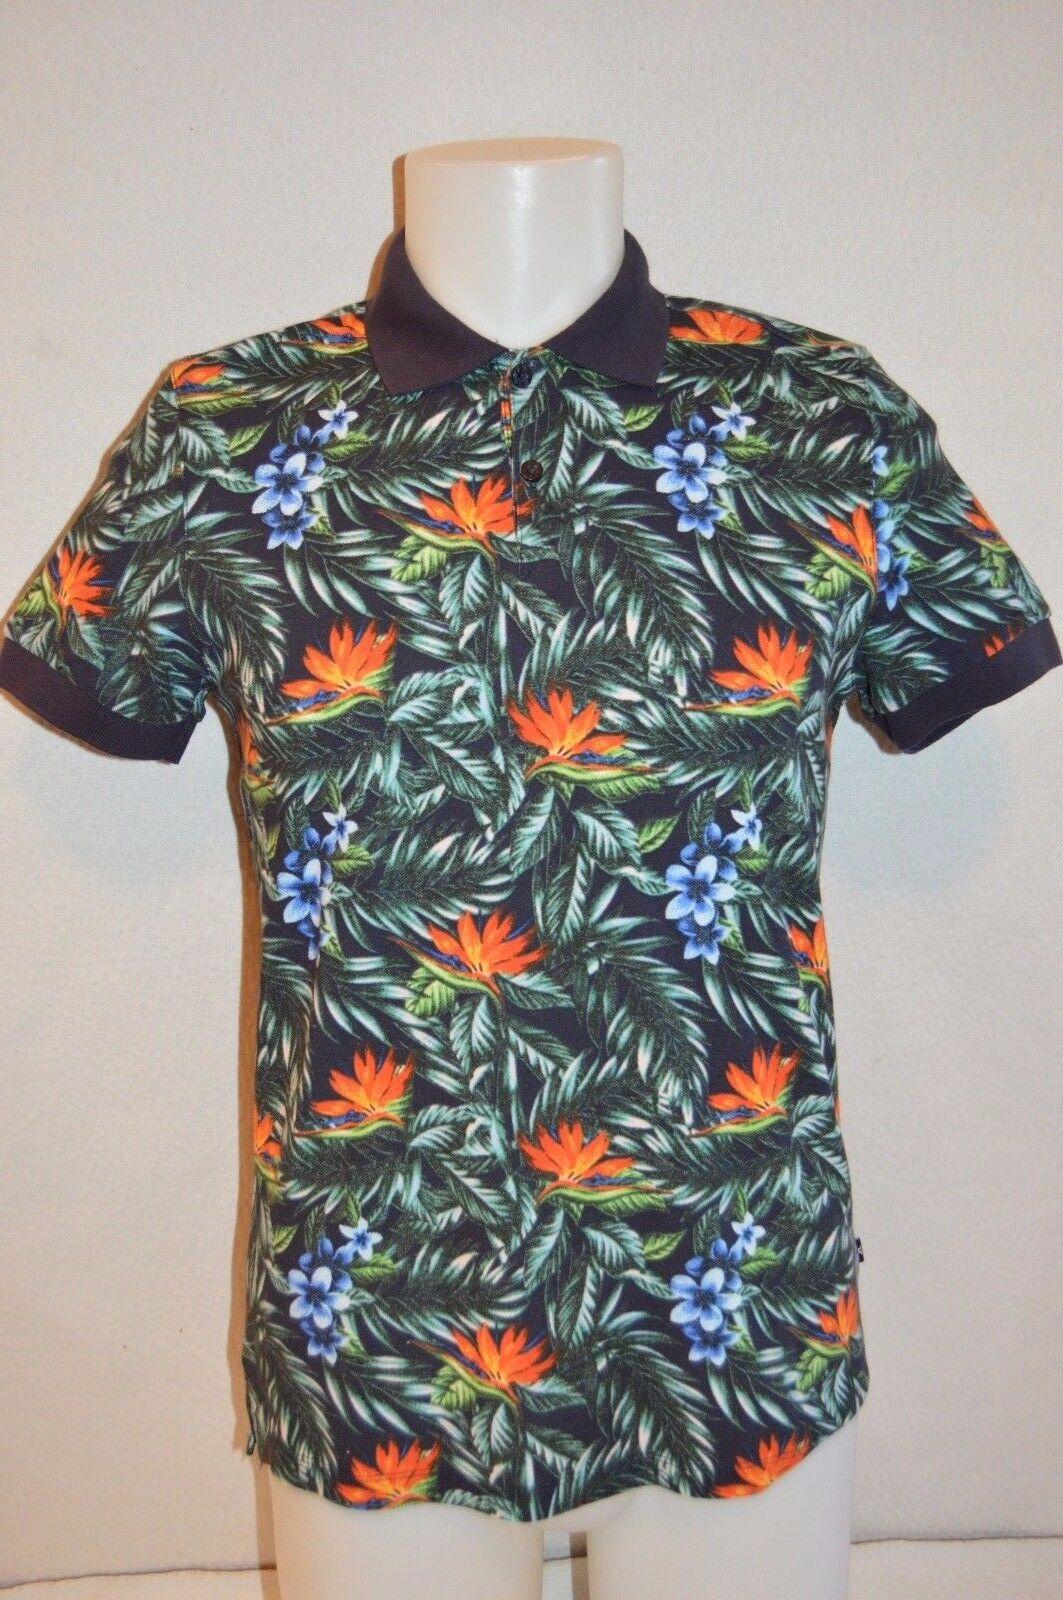 J. LINDEBERG Mans RUBI BOTANICAL PIQUE Polo Shirt NEW Größe Medium Retail 125